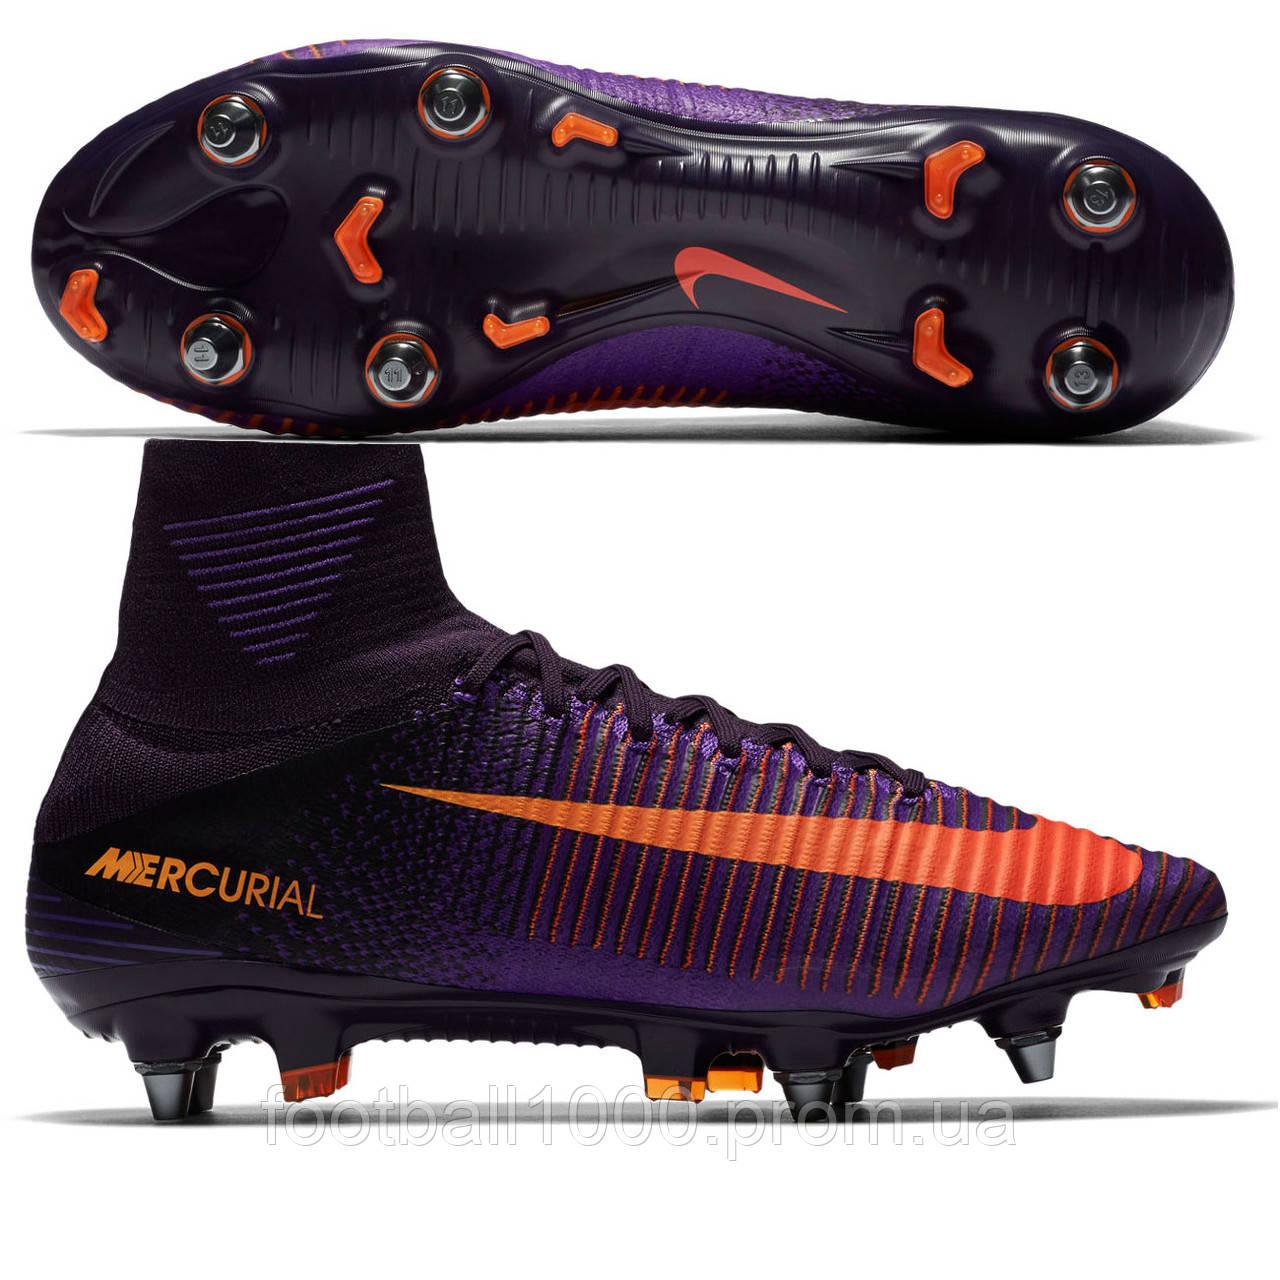 7571288a Бутсы футбольные Nike Mercurial Superfly V SG-PRO 831956-585 - ГООООЛ! >